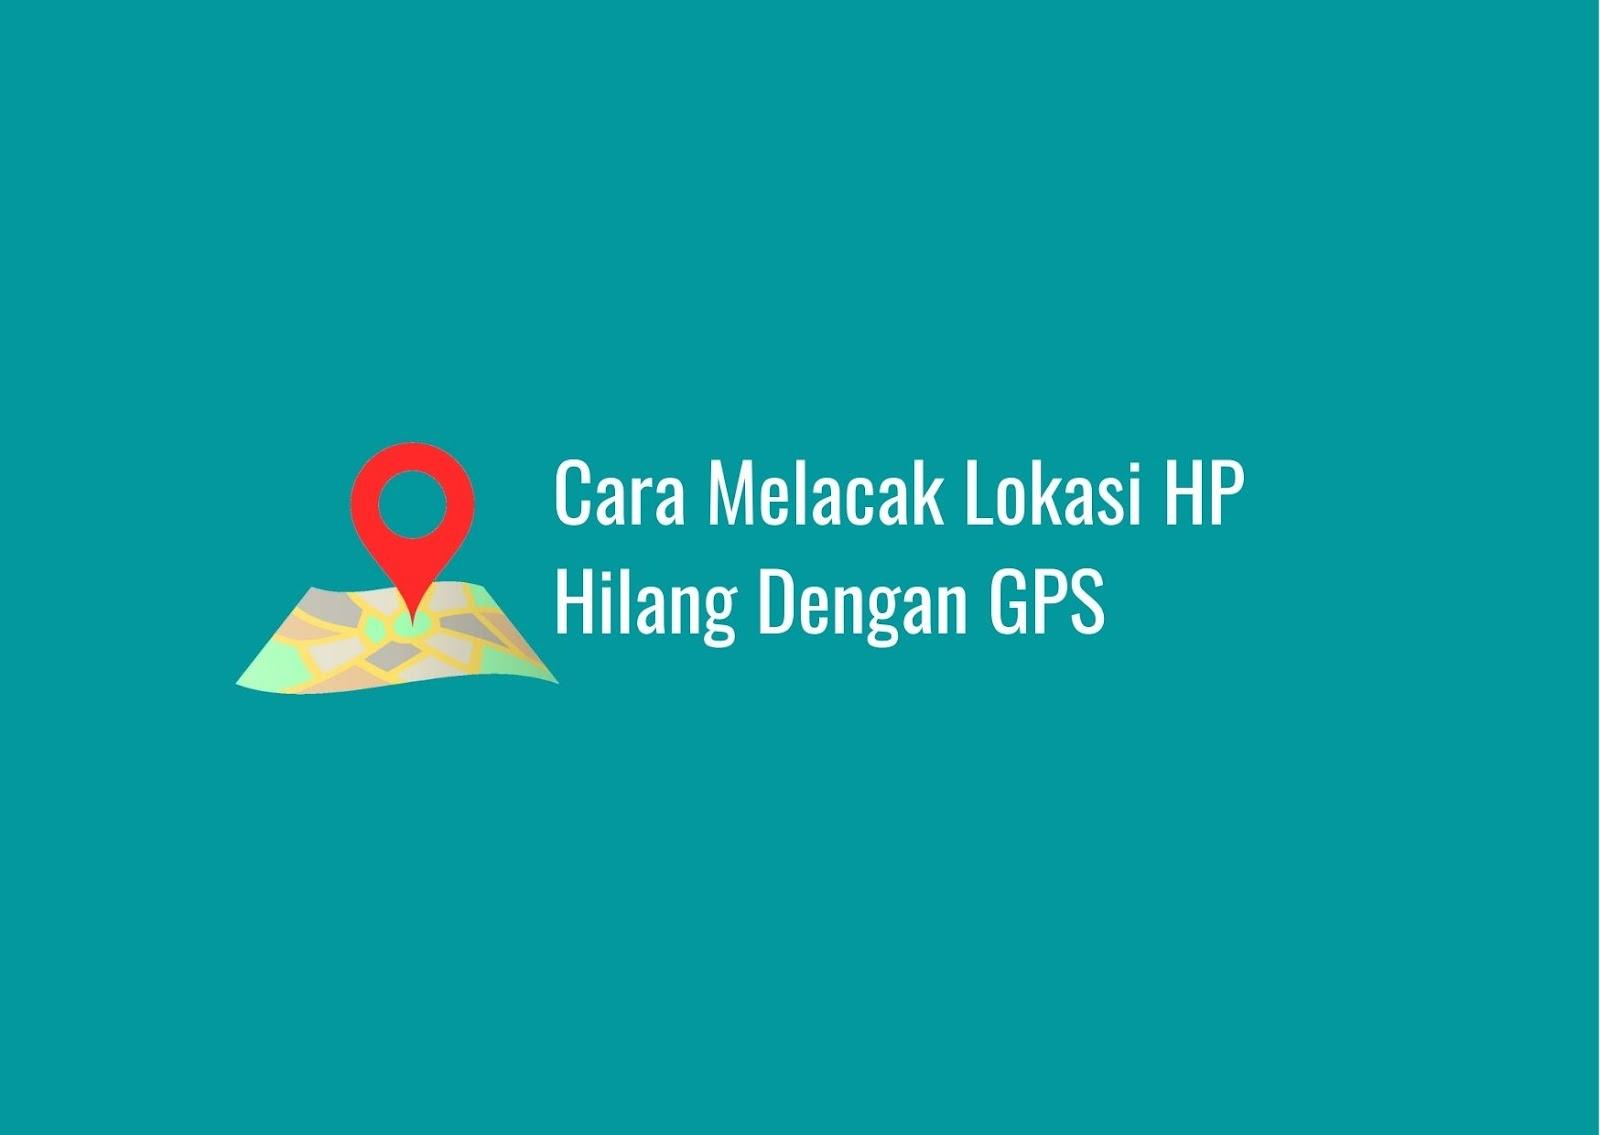 Cara Melacak Lokasi HP Yang Hilang Dengan GPS